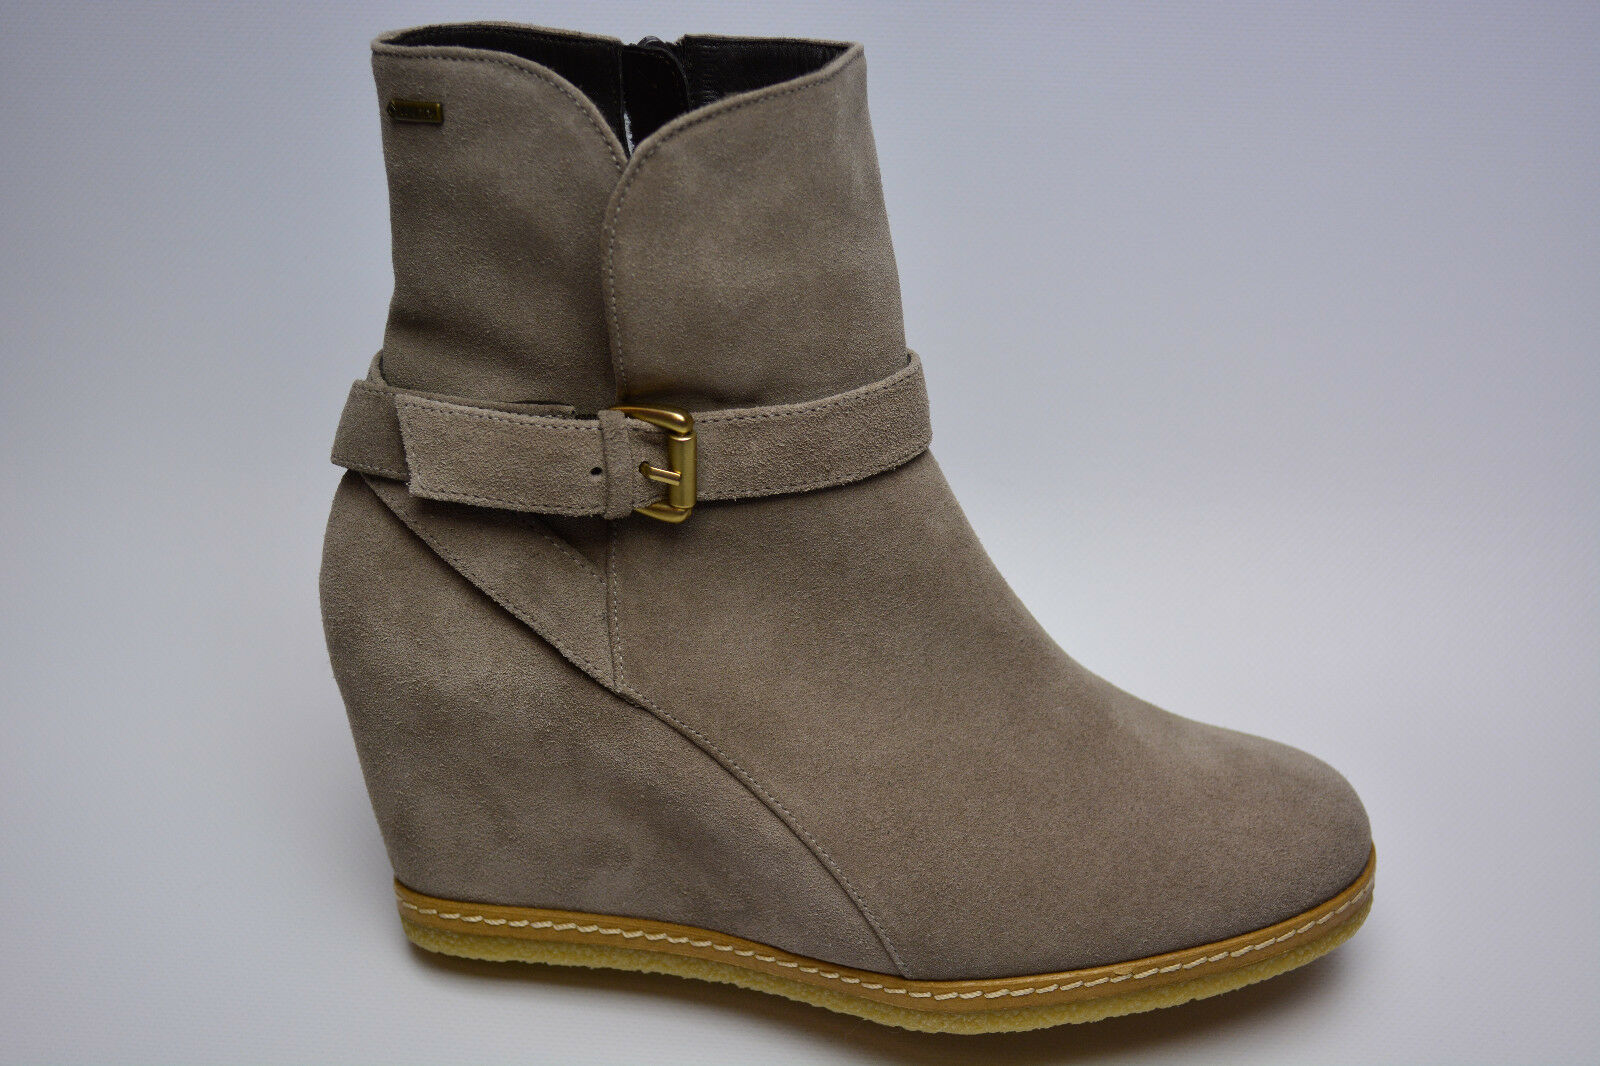 Högl Schuhe Damen Stiefeletten Echtleder Gore Tex Keilabsatz